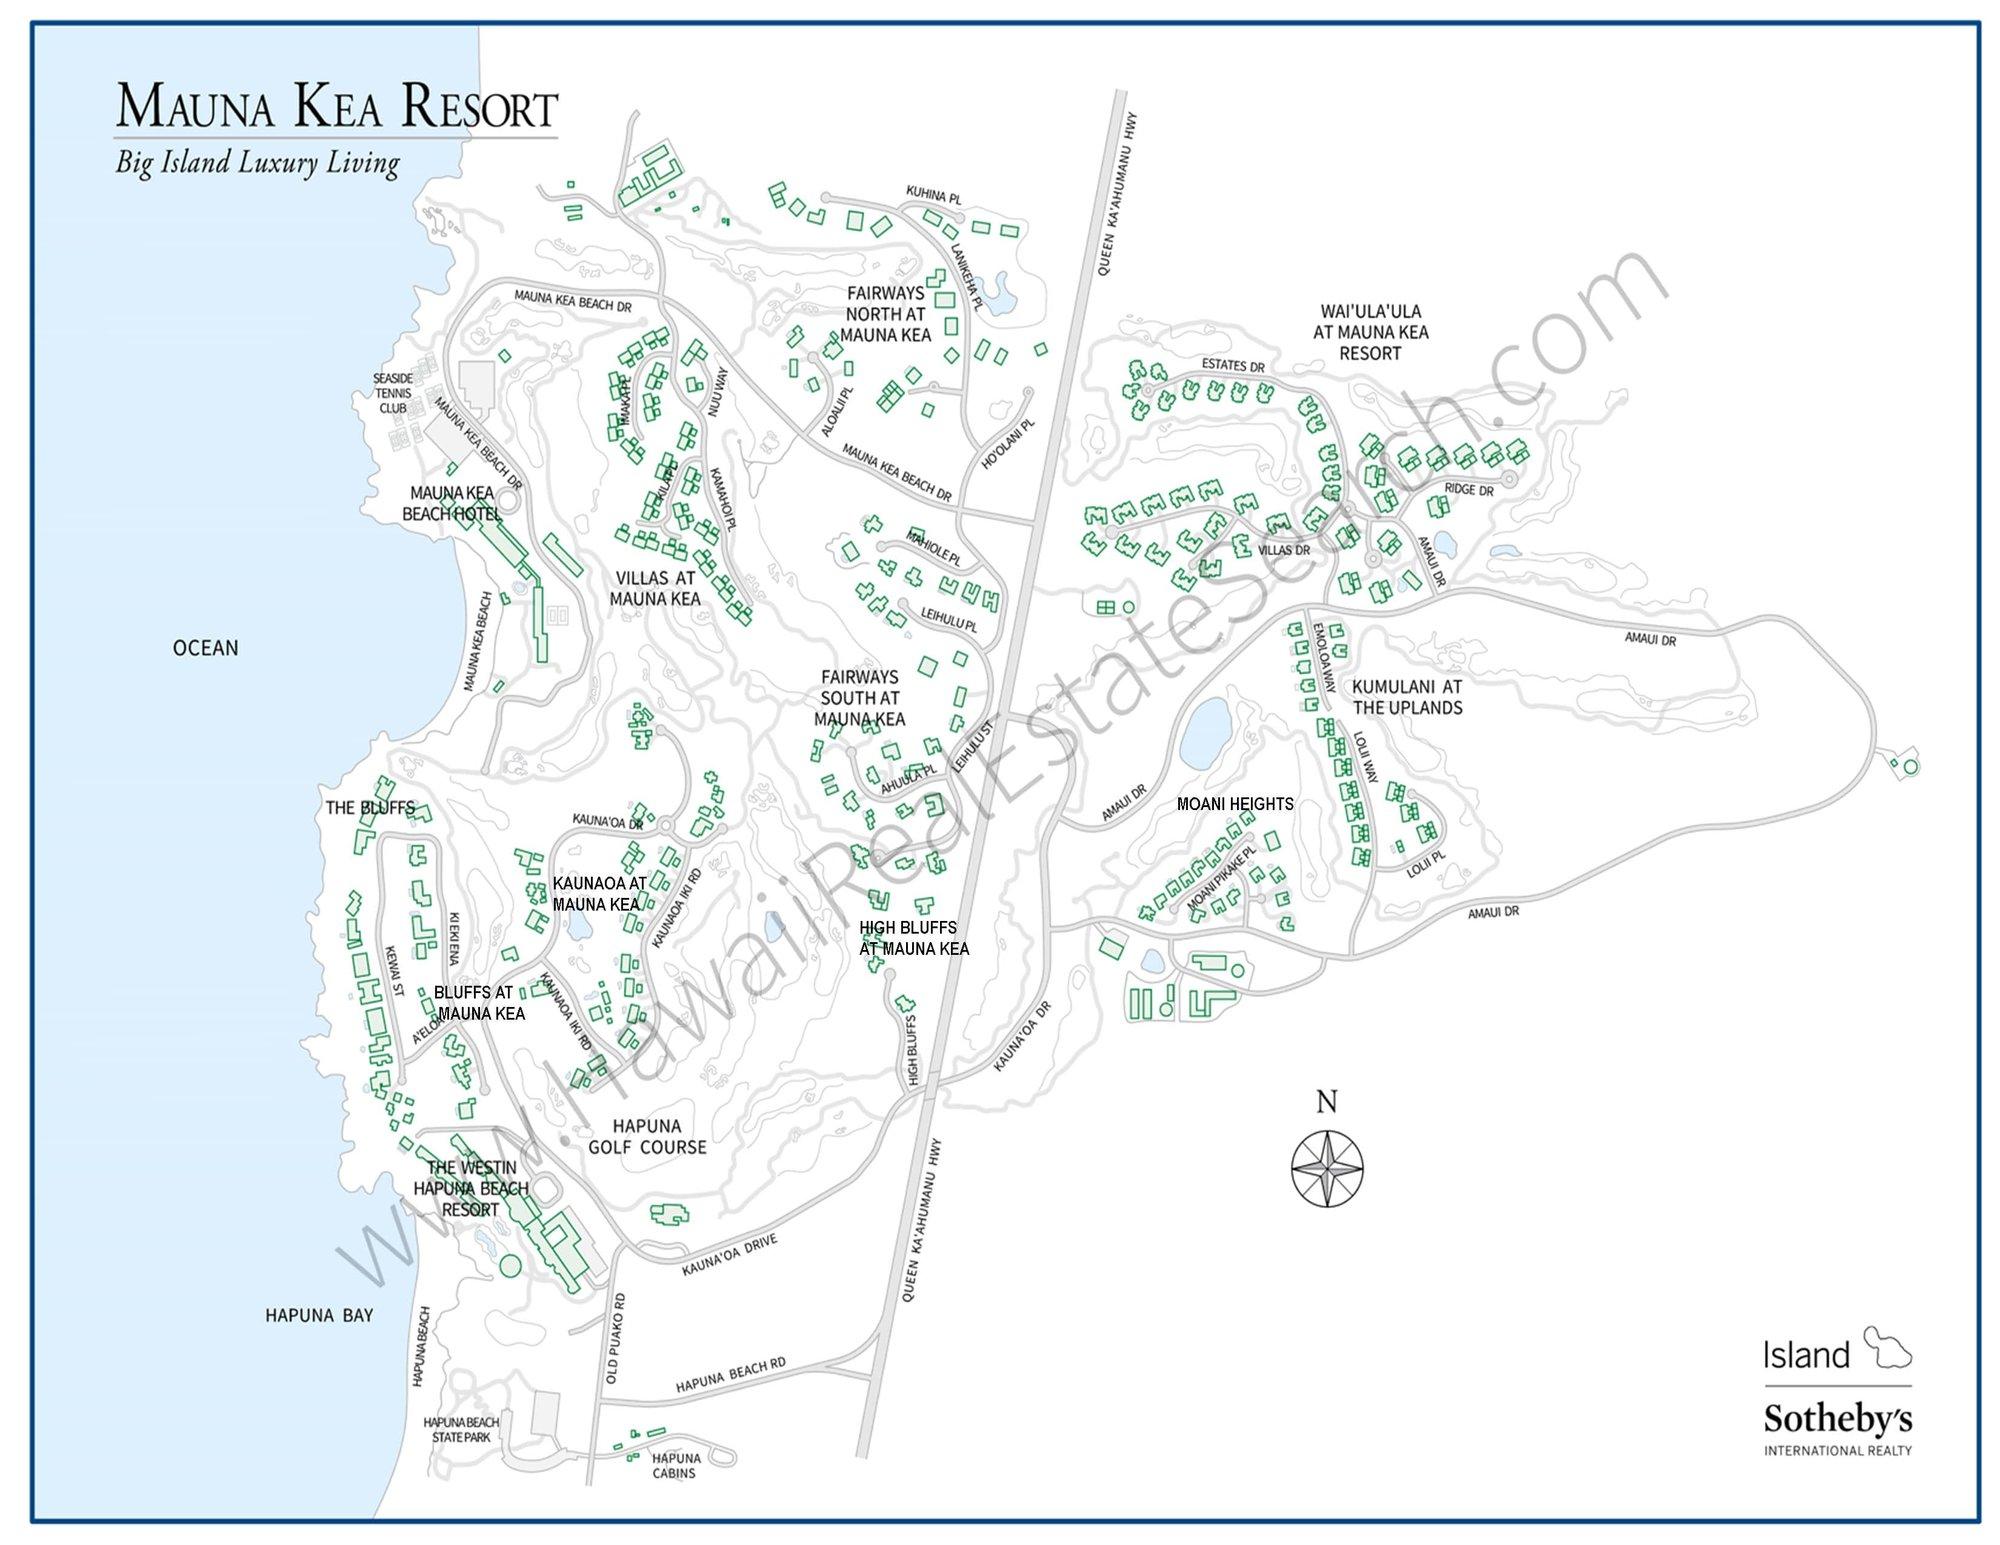 Mauna Kea Resort Real Estate Big Island Luxury Homes And